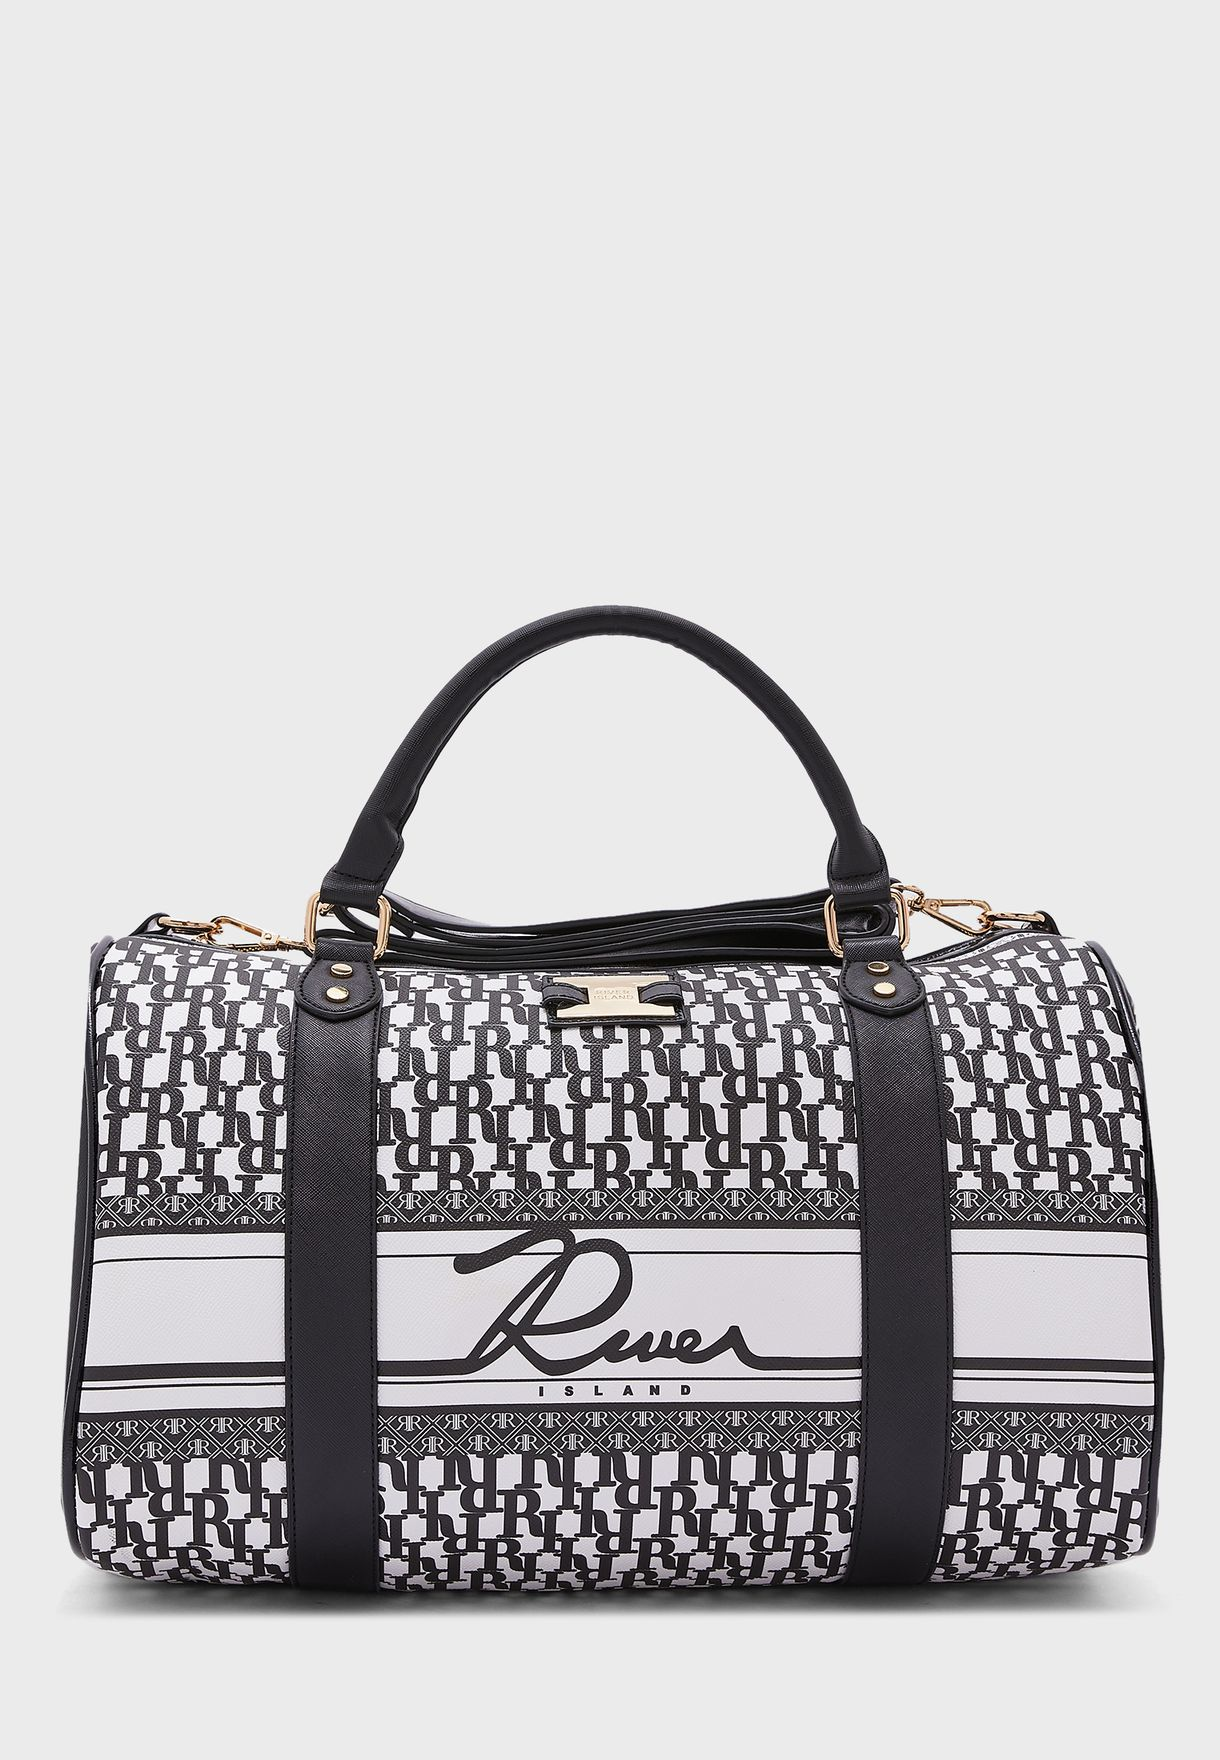 5244 Monogram Barrel Bag